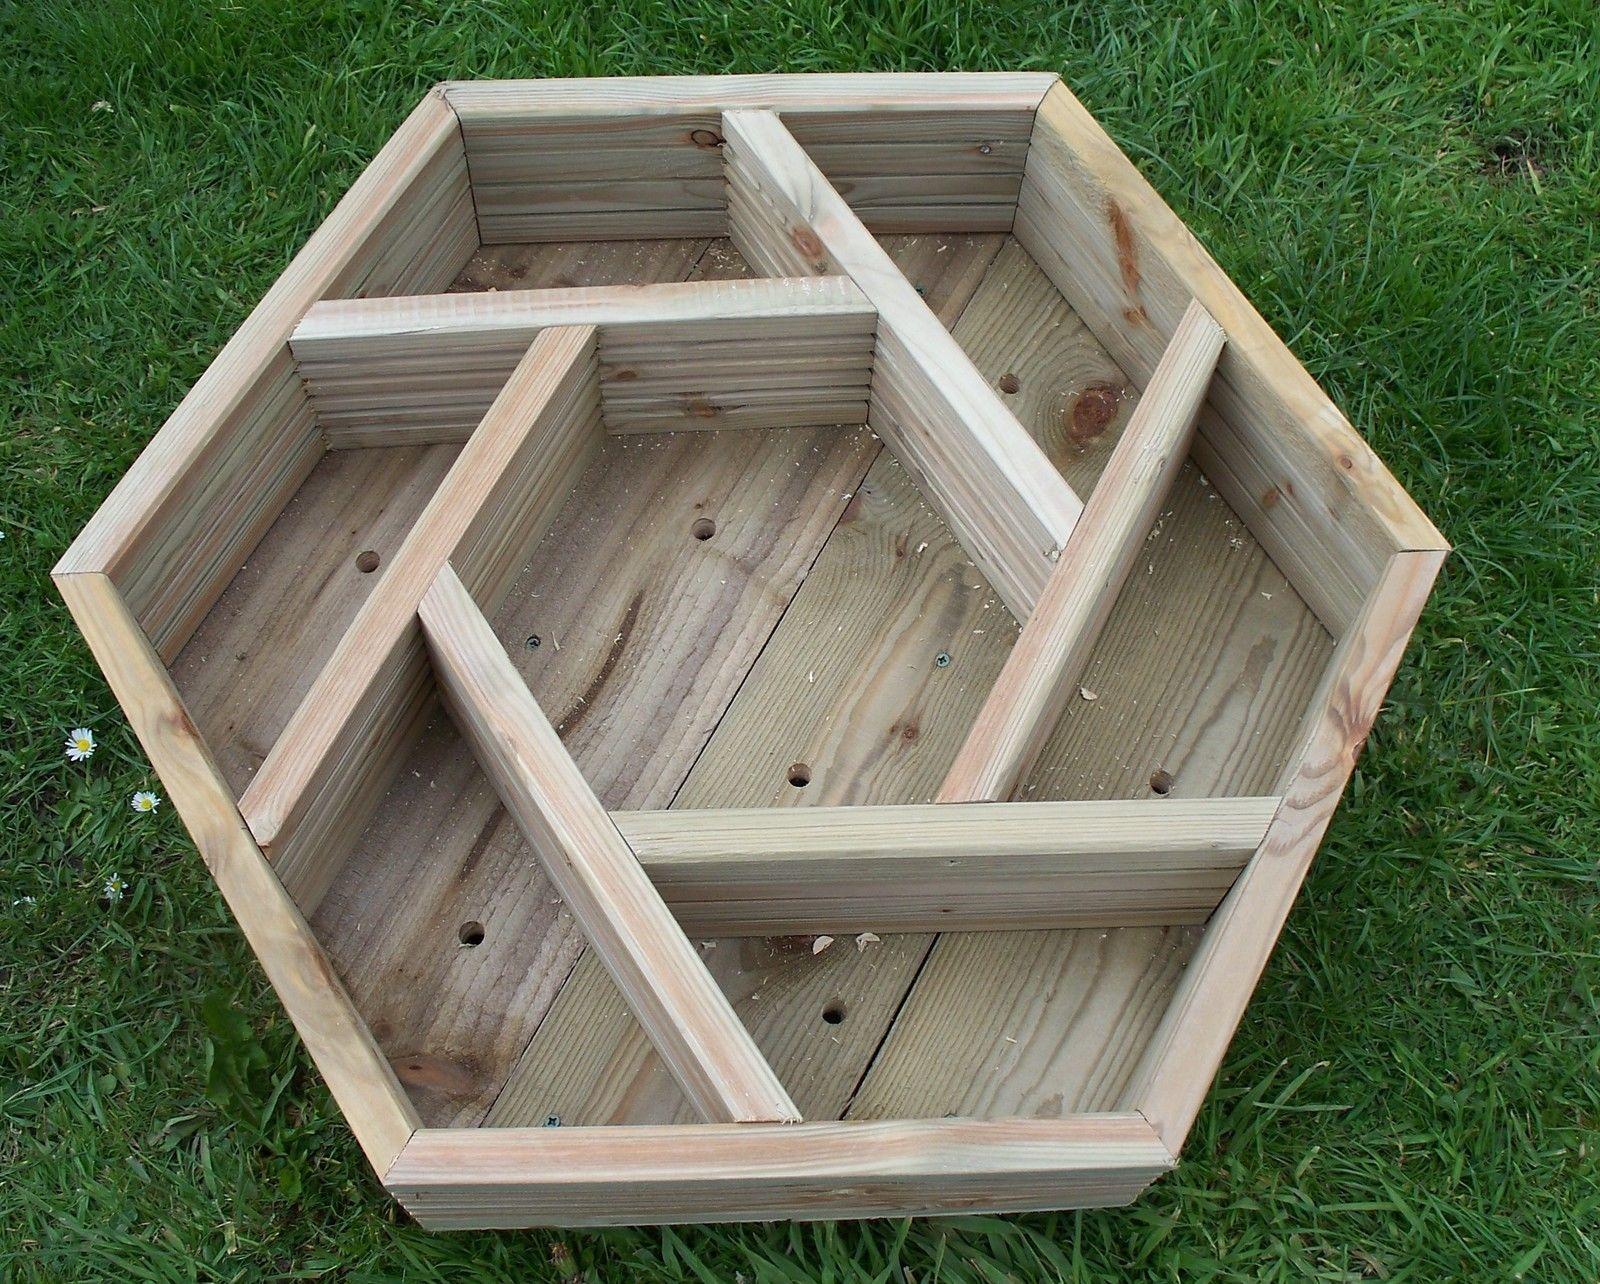 Wooden Herb Wheel Planter Wood Trough Timber Hexagonal Planter